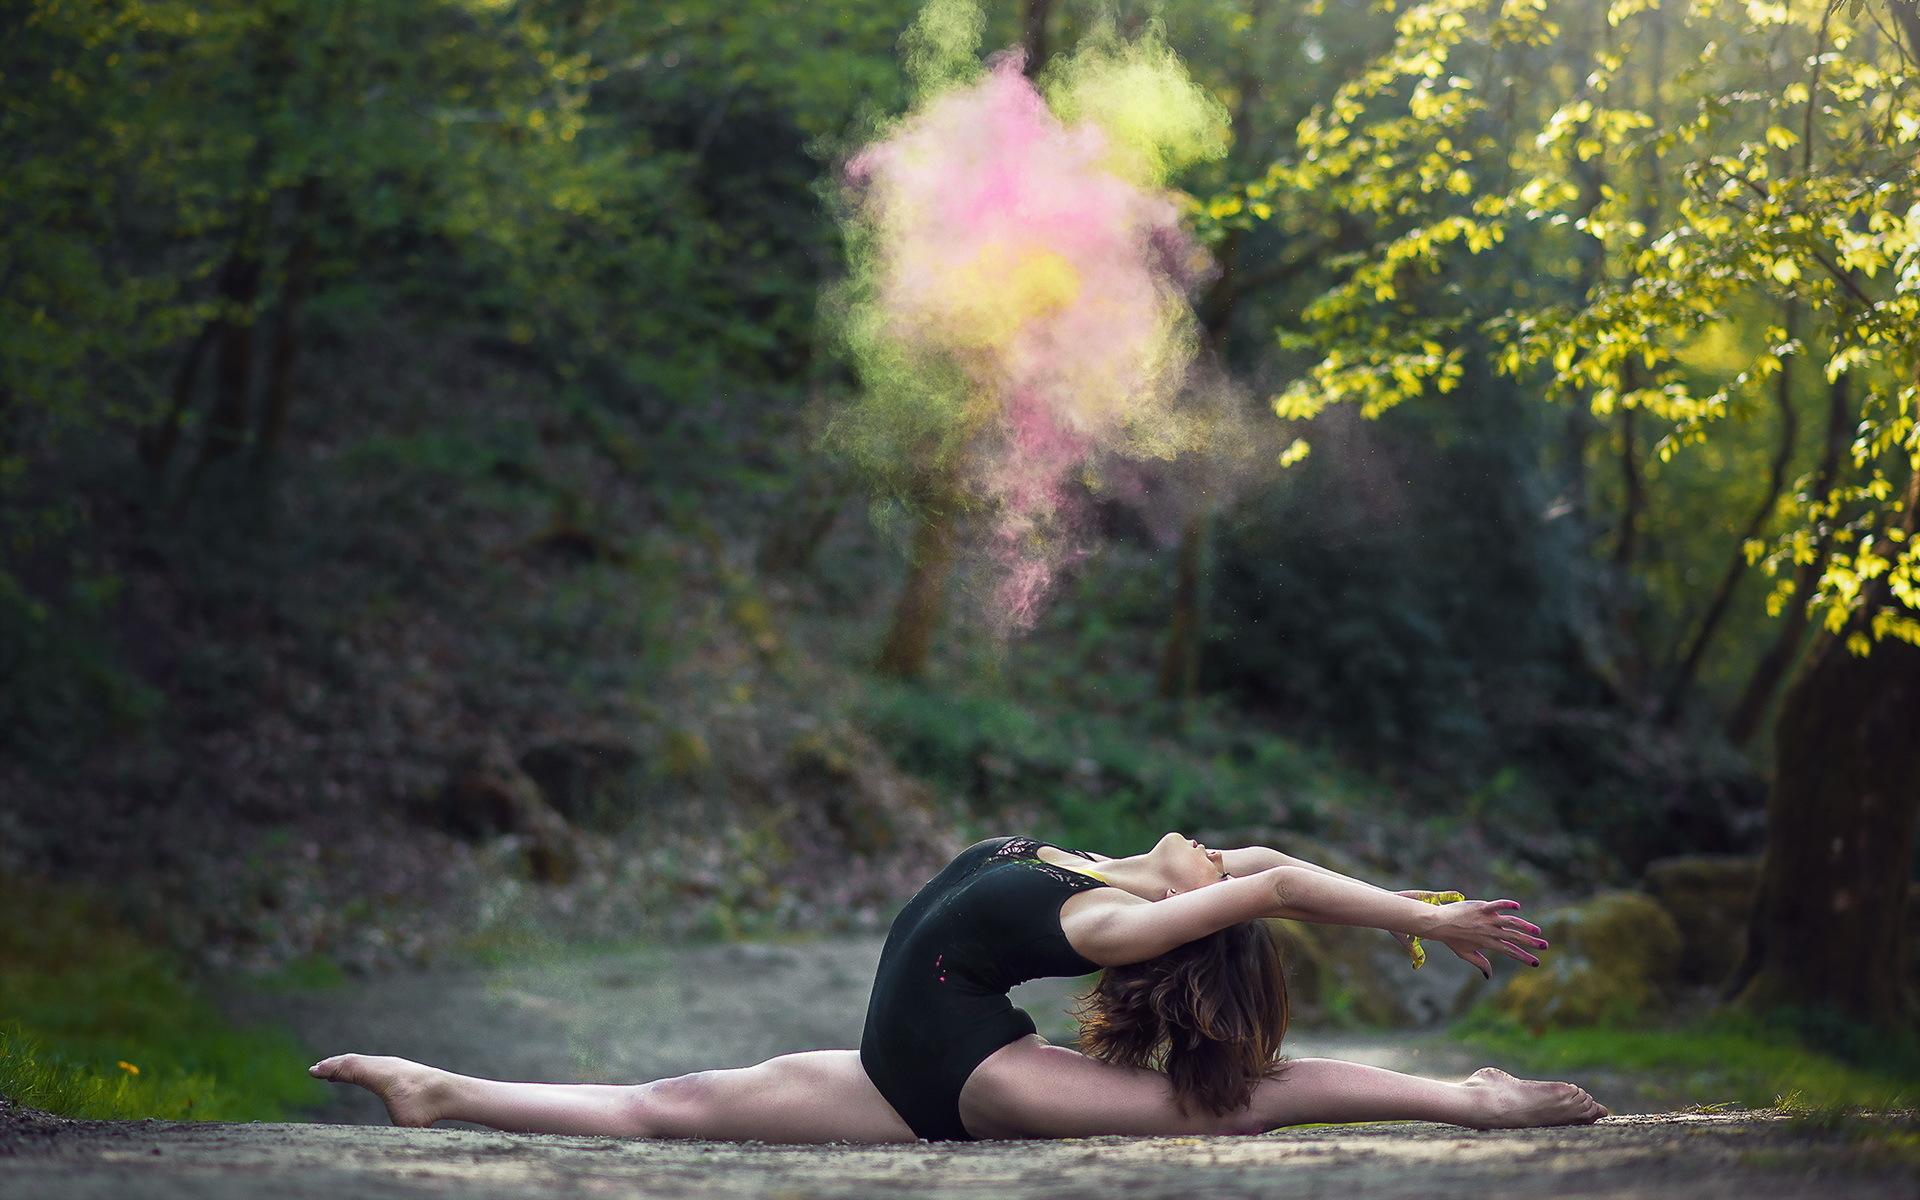 проникновению чужеродного гимнастки девушки на озере фото сама